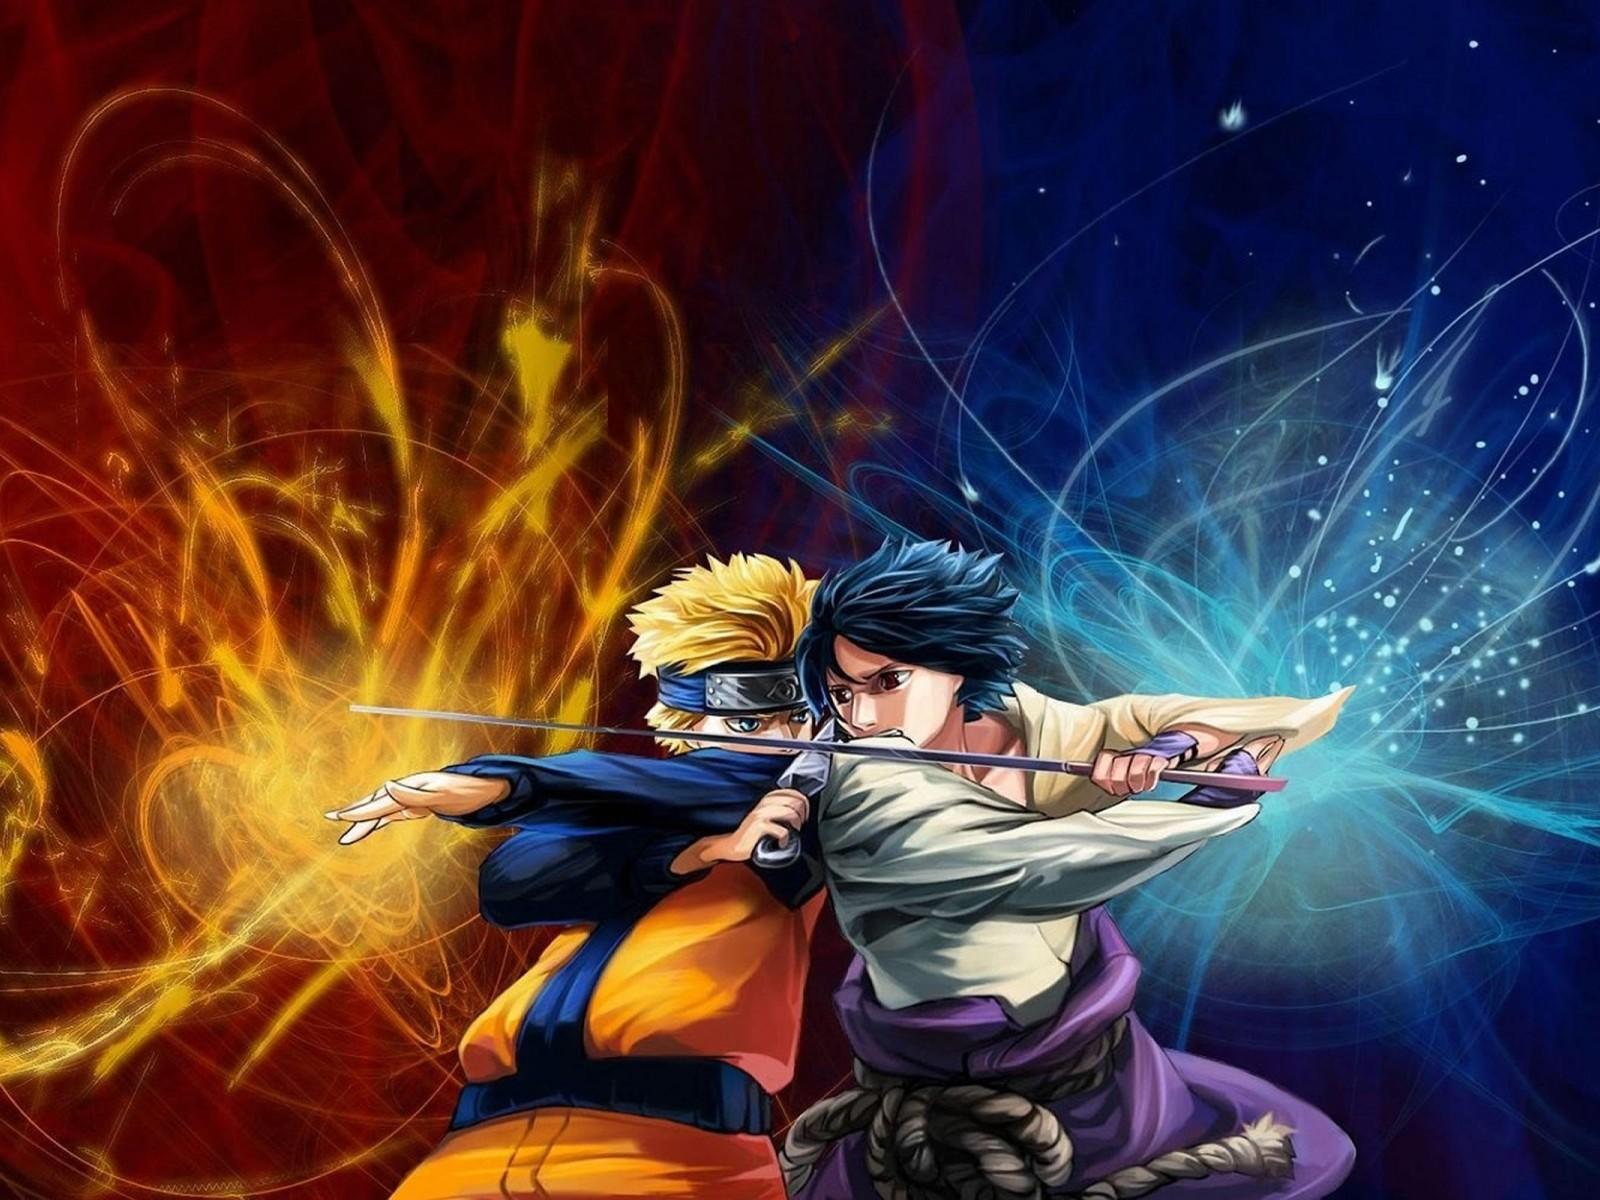 de la pea otaku martea Wallpapers Anime HD   Naruto Shippuden 1600x1200